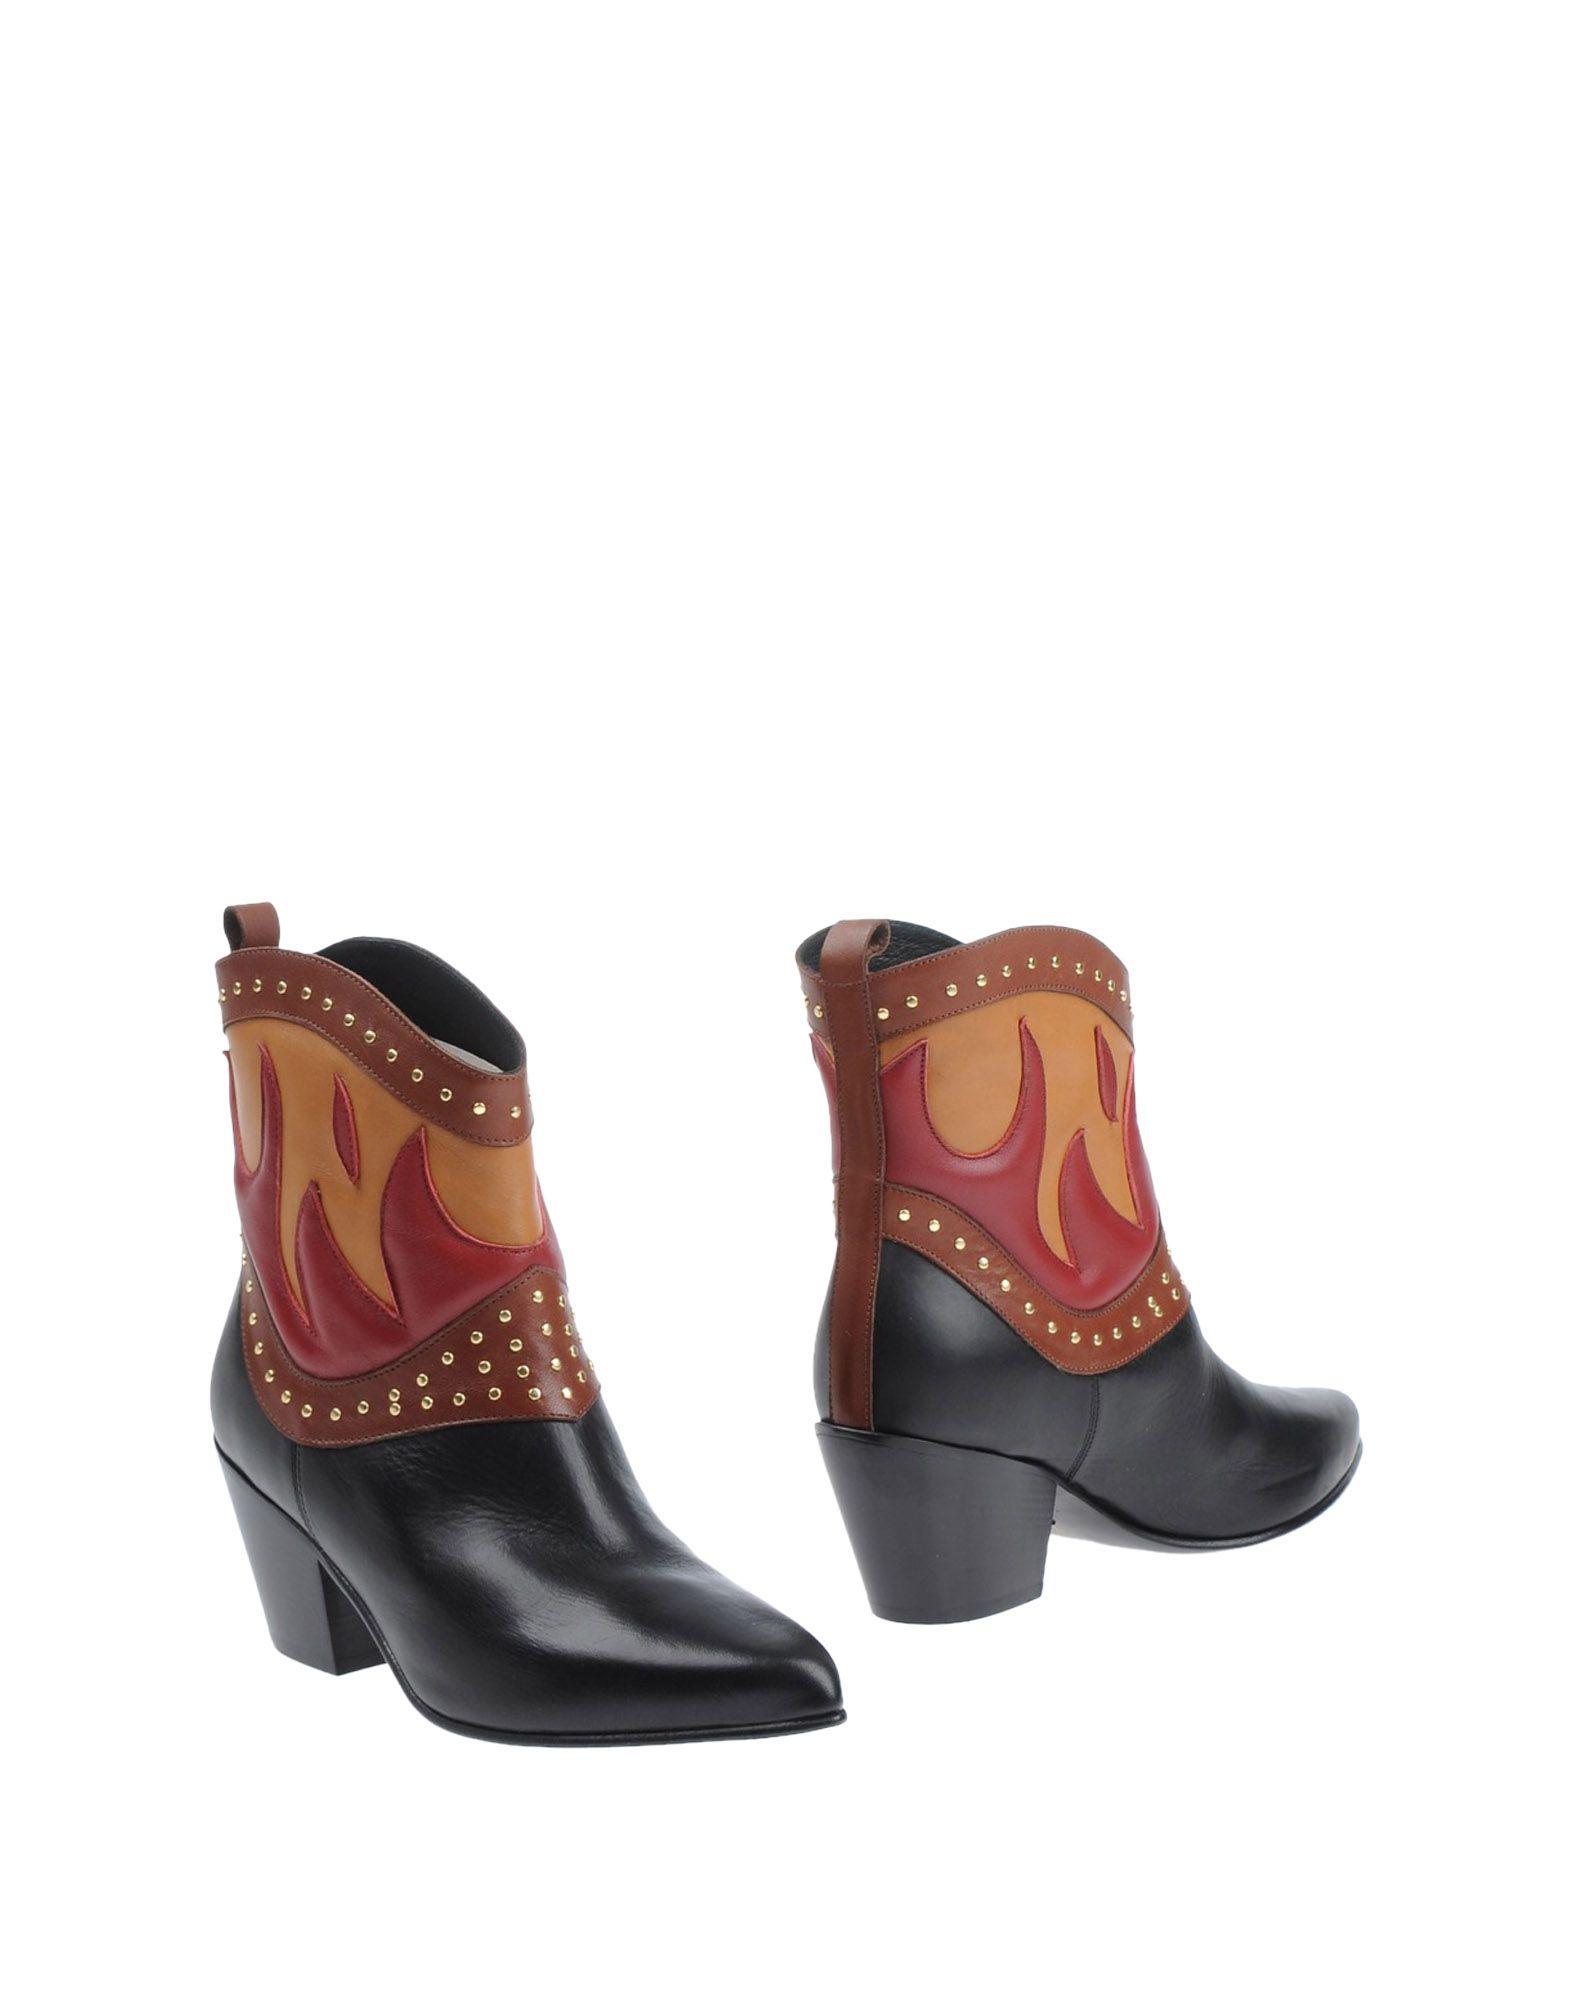 JUST CAVALLI Полусапоги и высокие ботинки just cavalli полусапоги и высокие ботинки